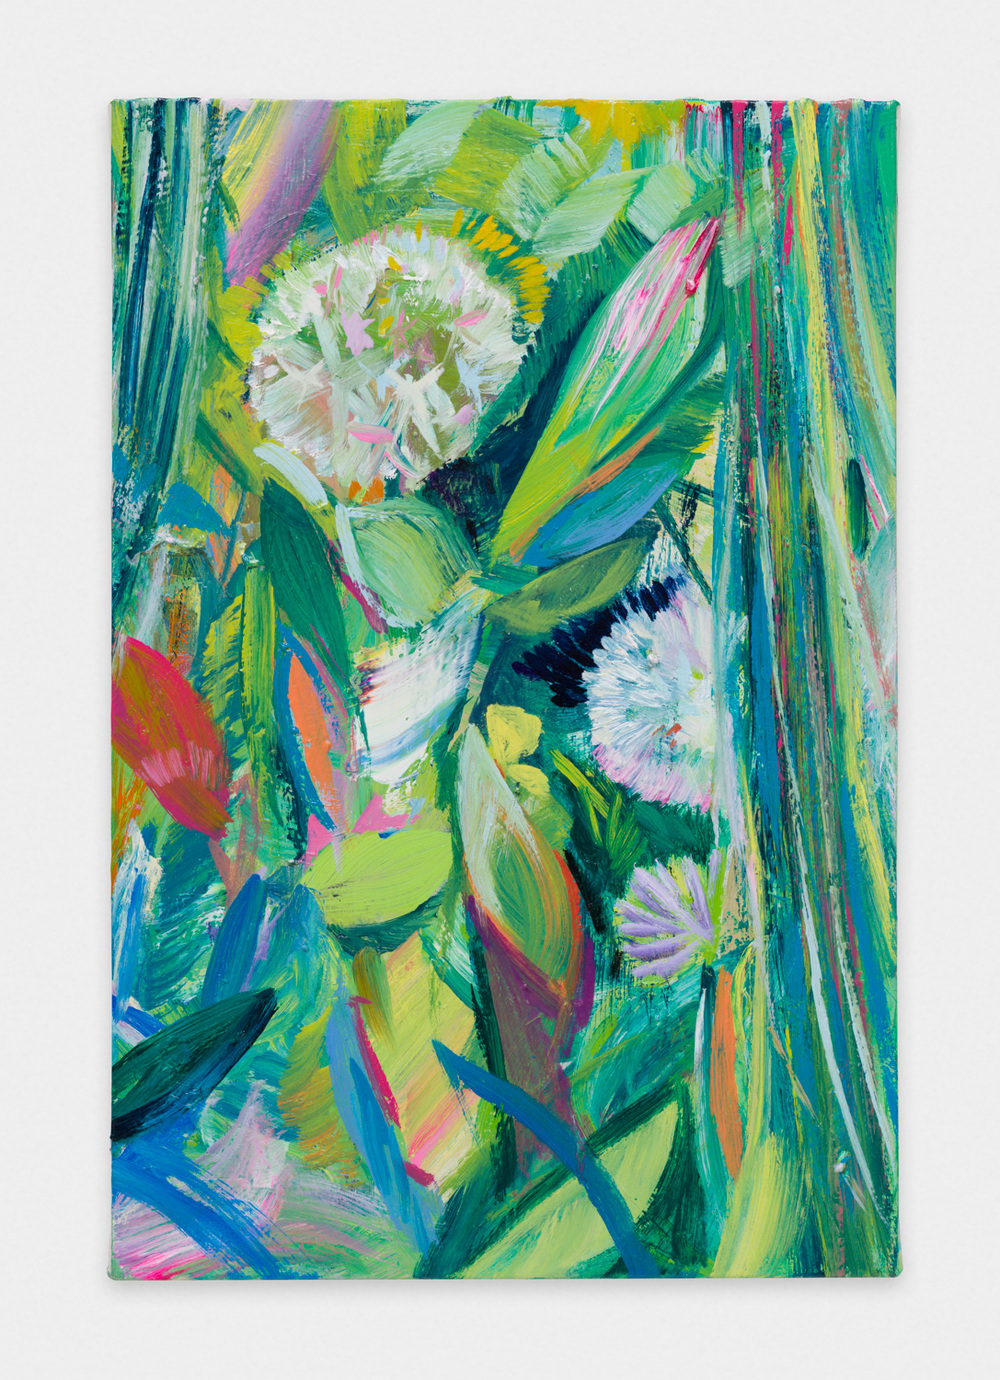 Miki Mochizuka  G  2015 - 2016 Oil on canvas 16.14h x 10.75w in (41h x 27.3w cm) MikiM007